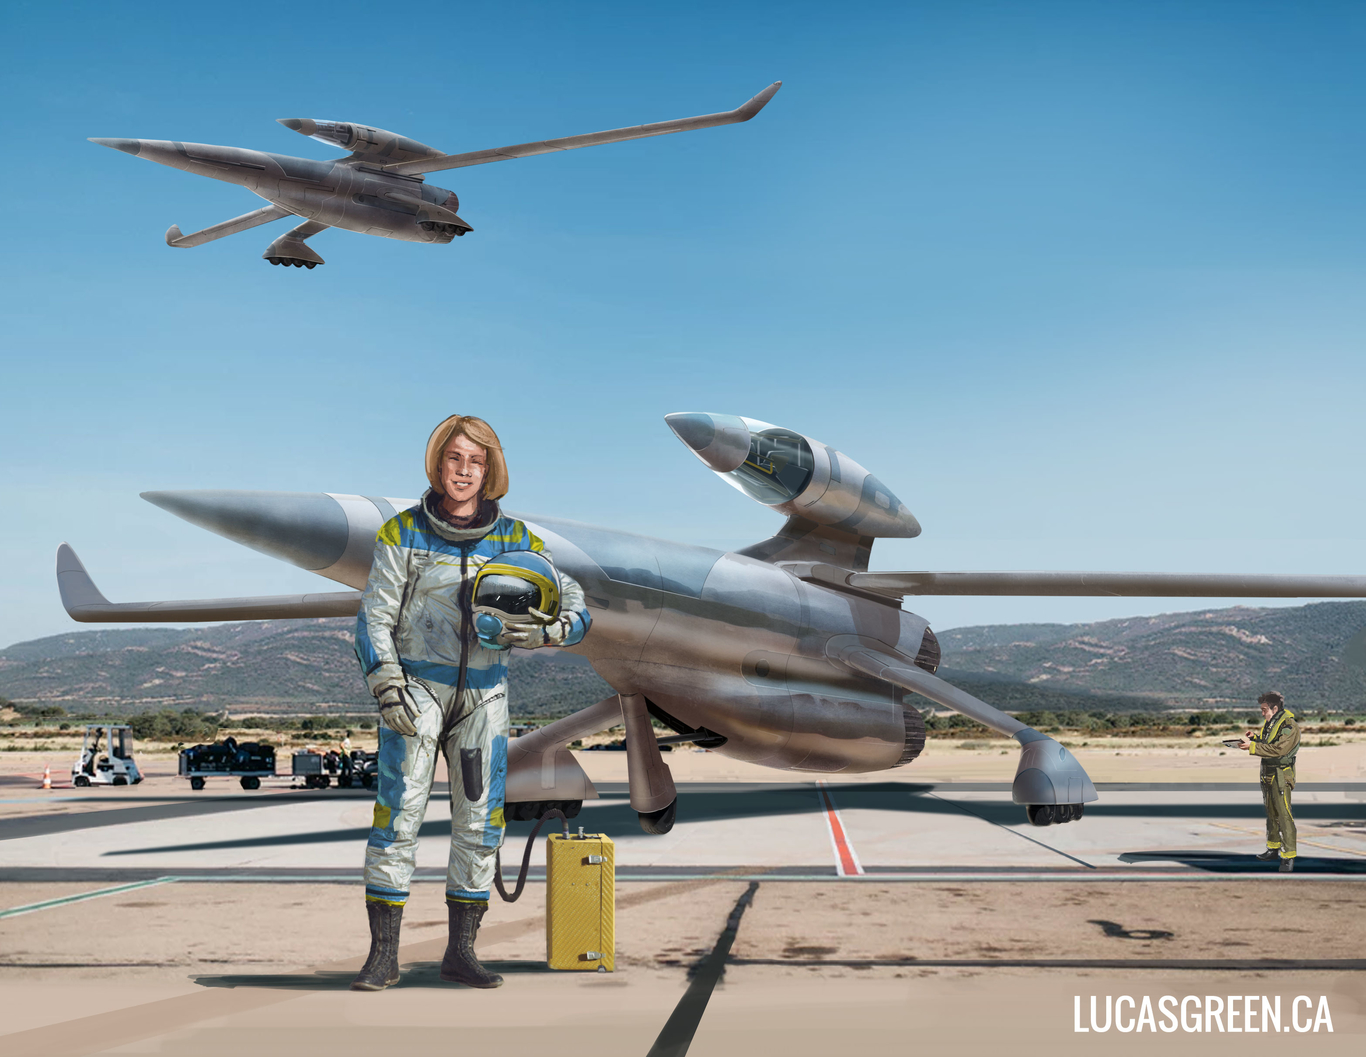 Lucasgreen rocketplane 1 885c9fef p805